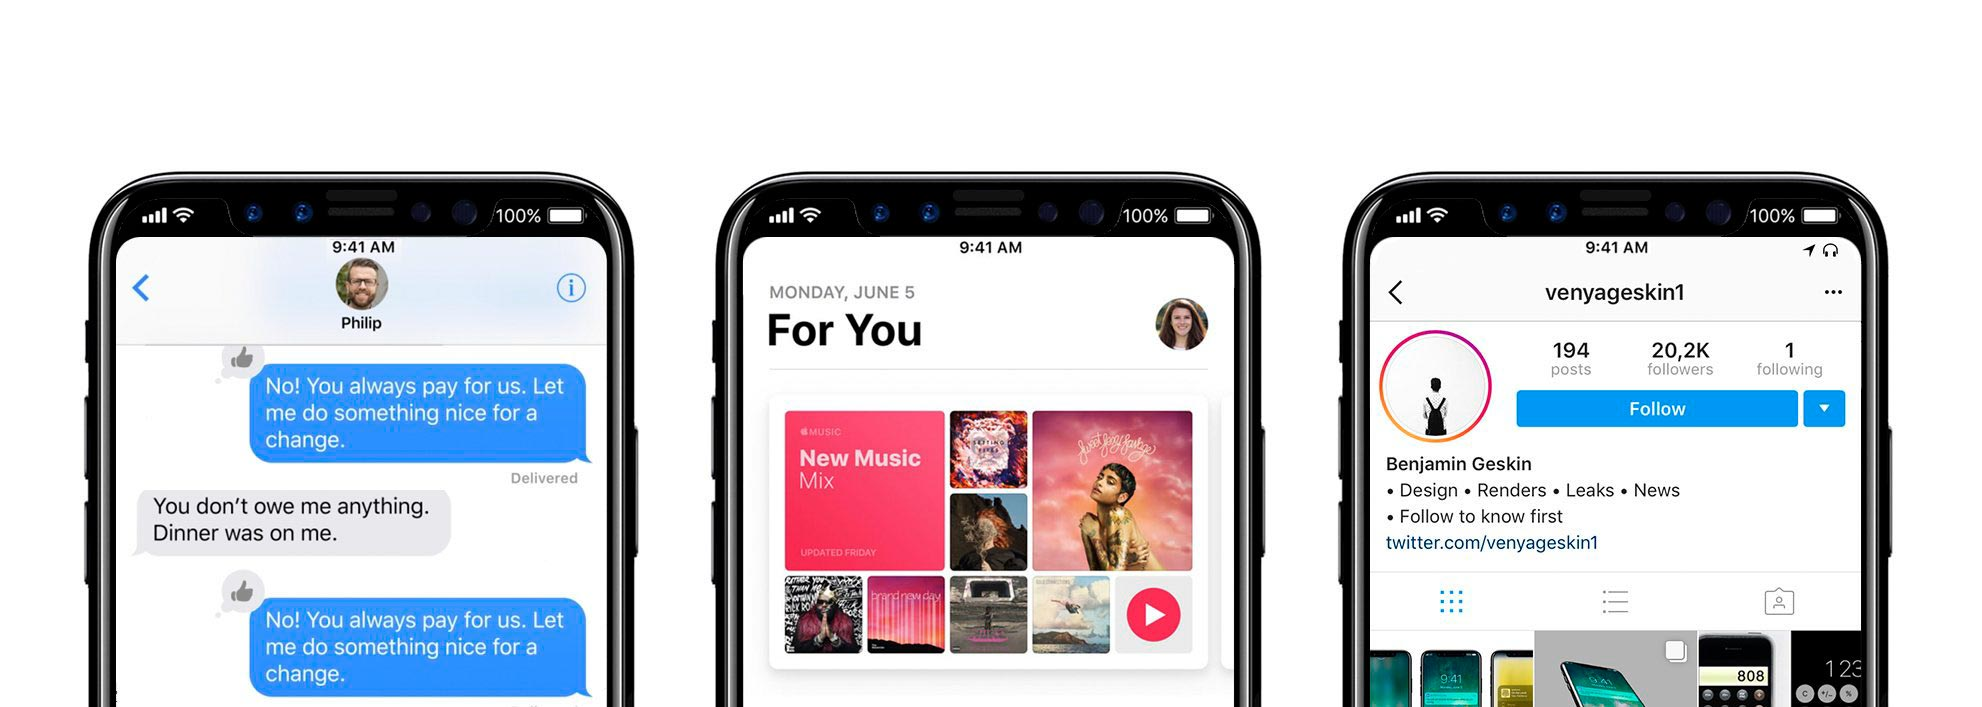 iPhone-8-frontal-negro